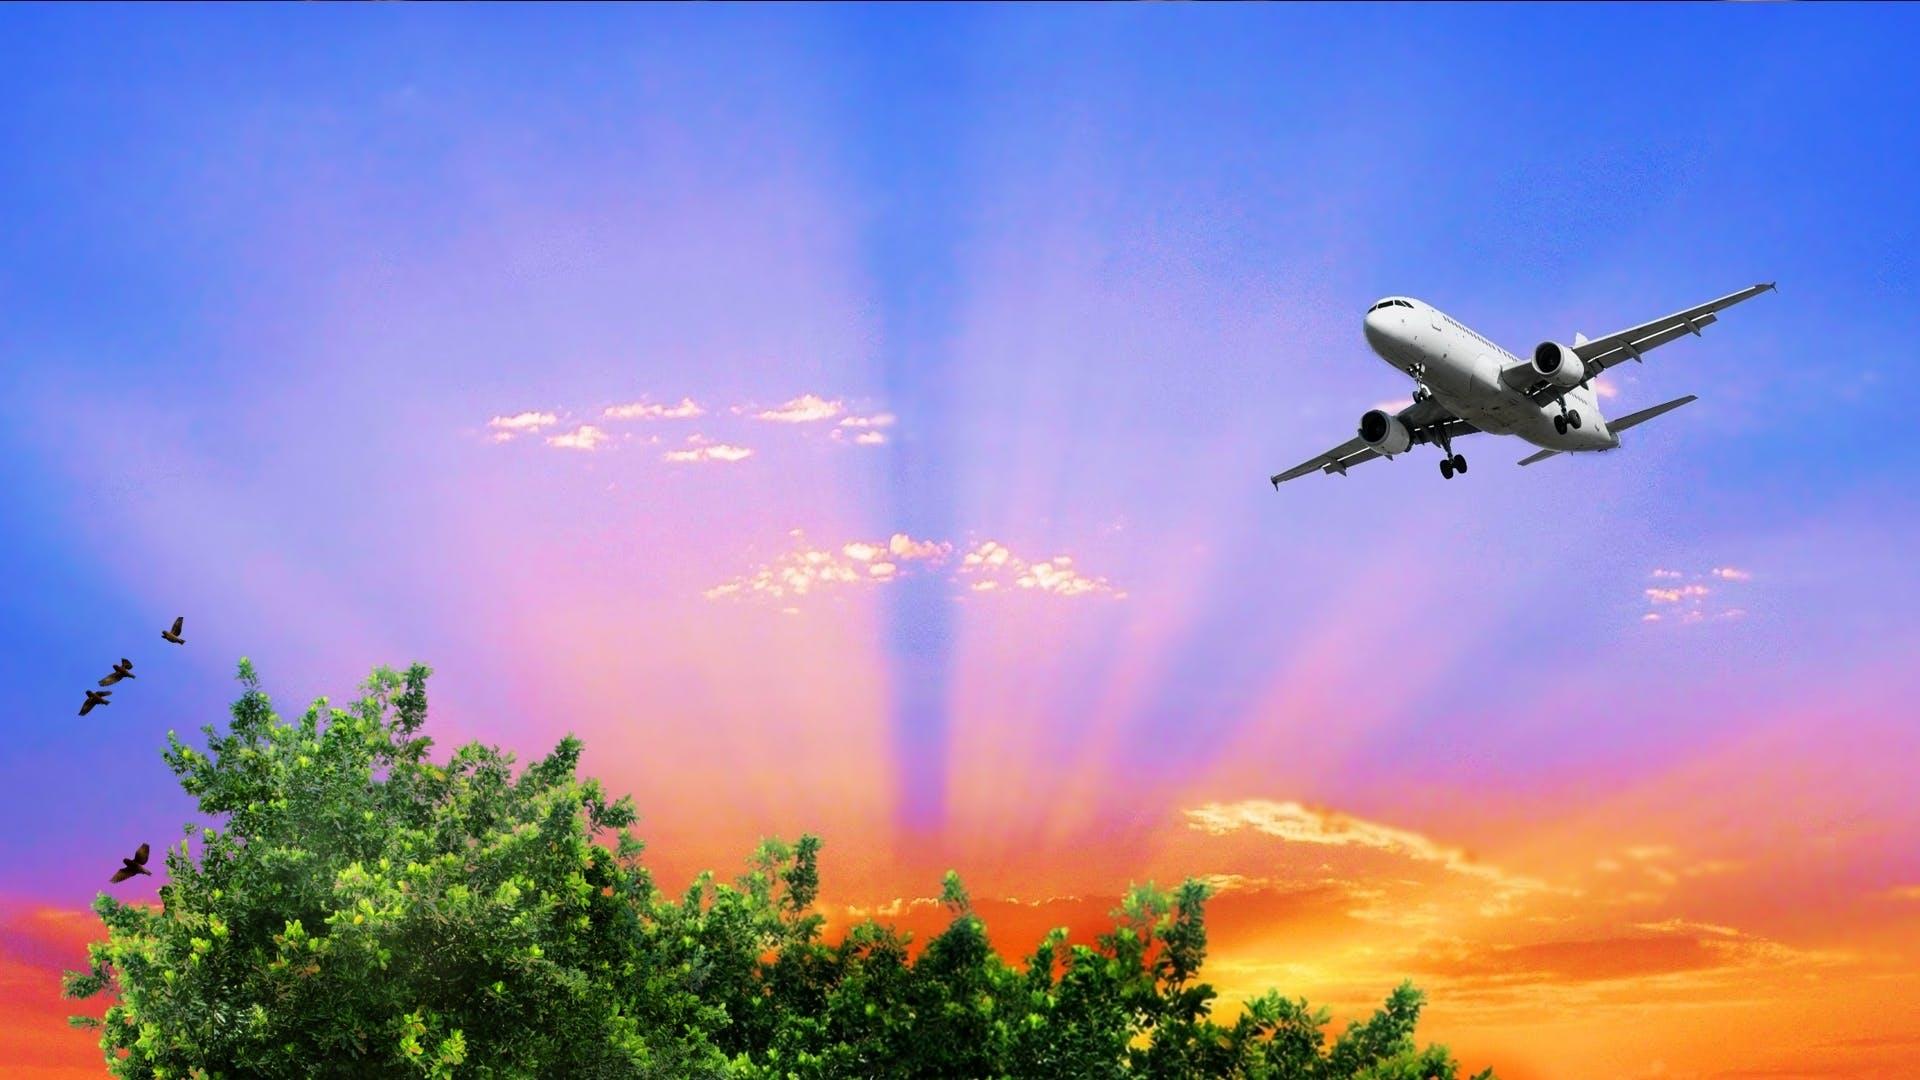 Free stock photo of avião, birds, clouds, plant